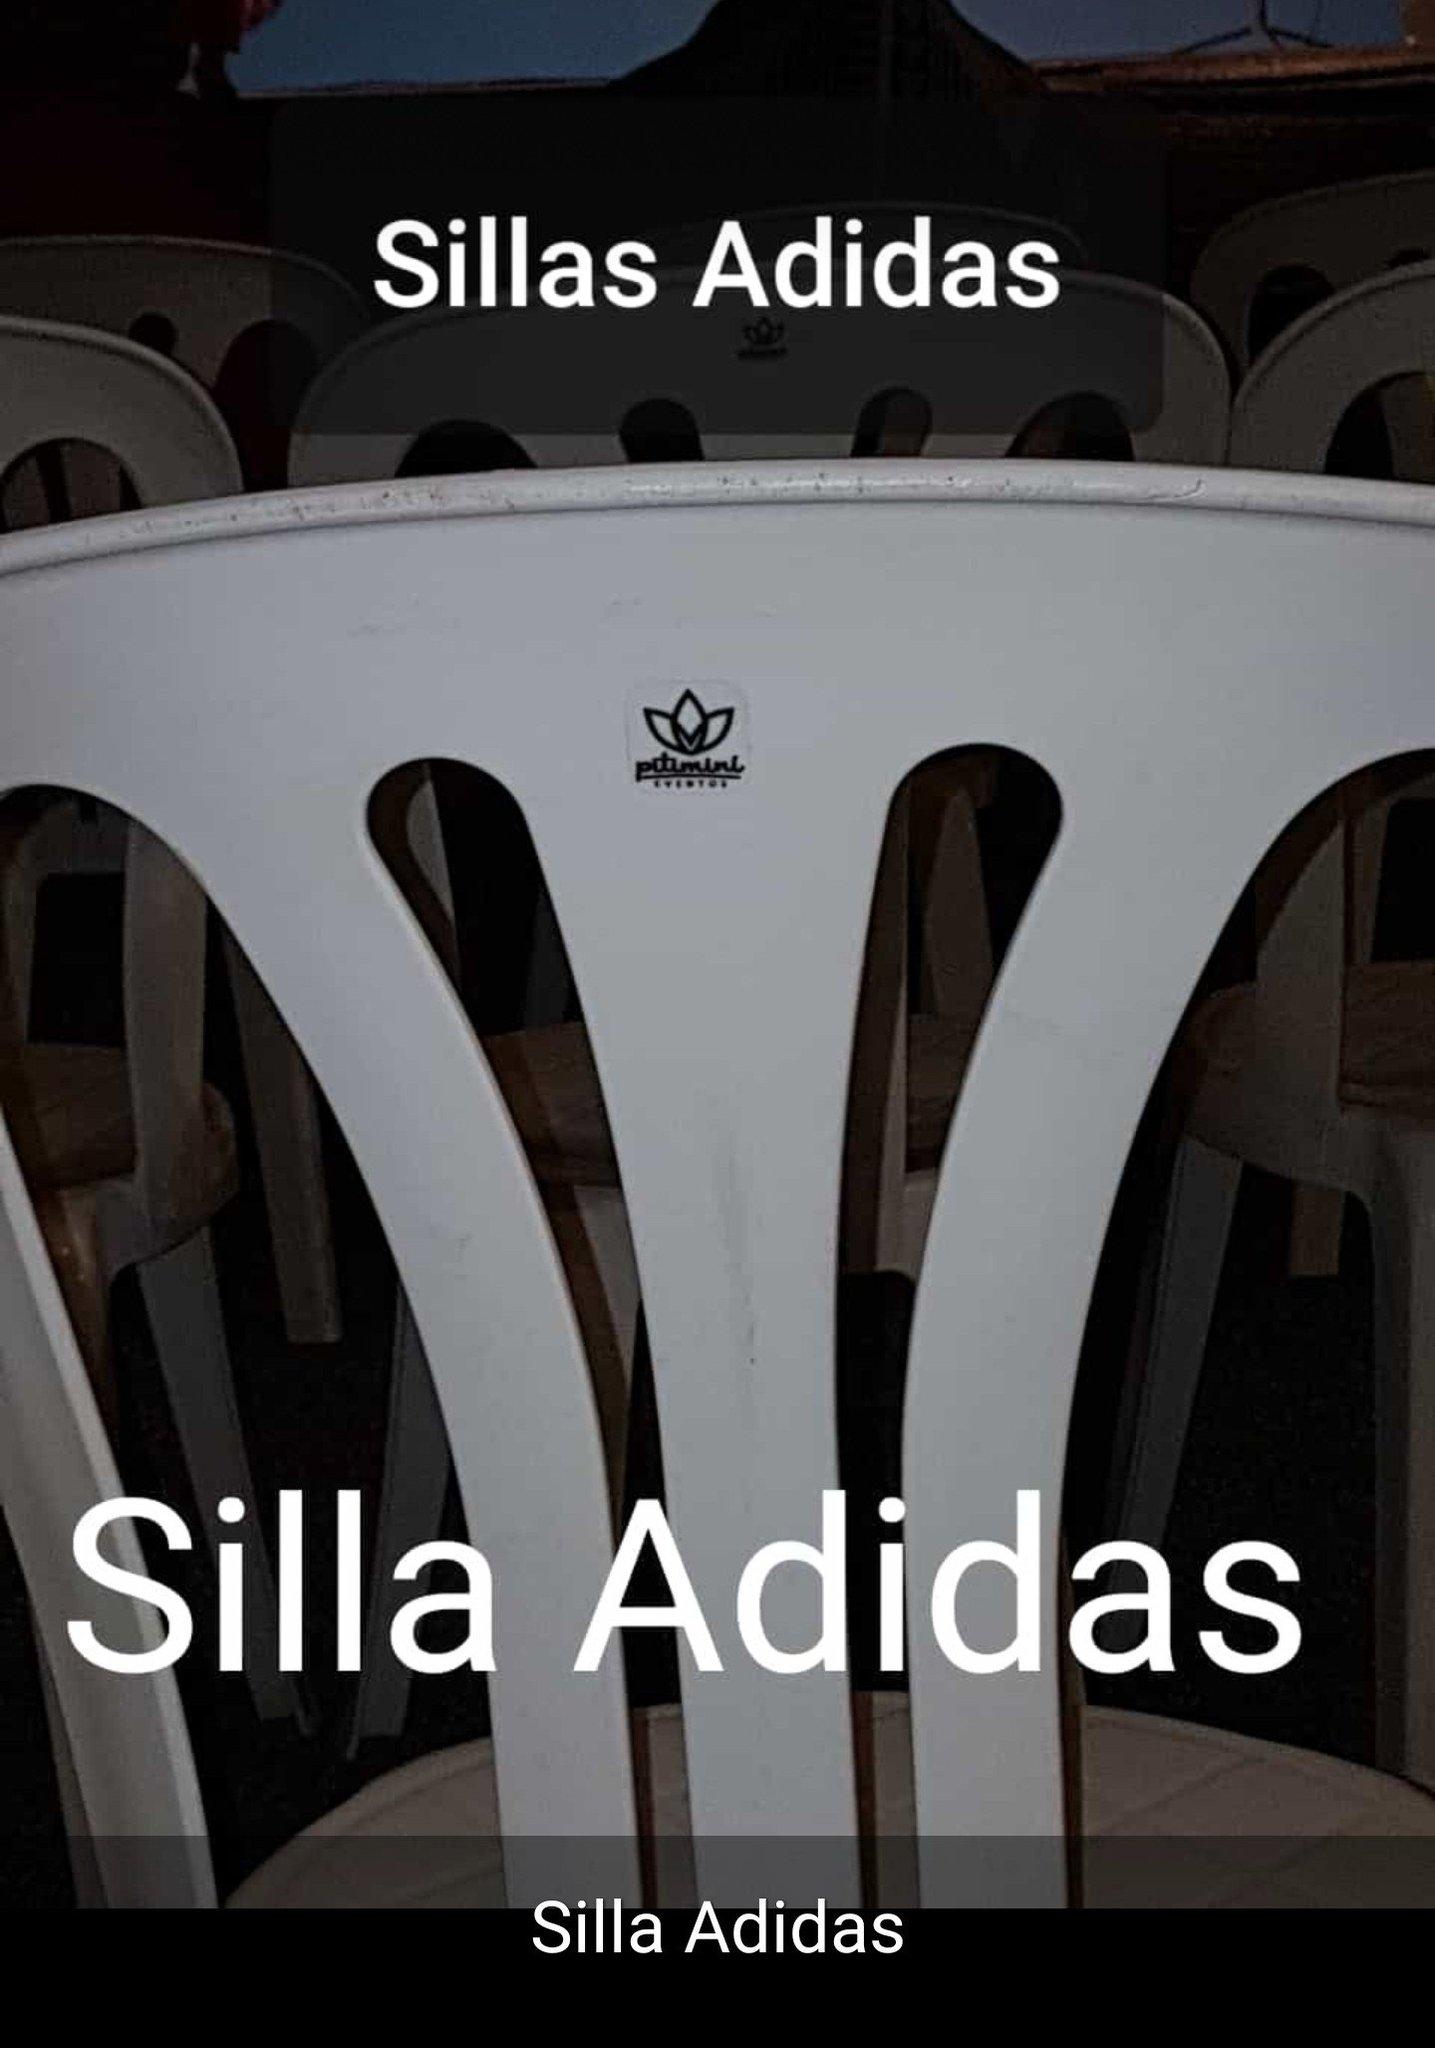 Silla Adidas - meme